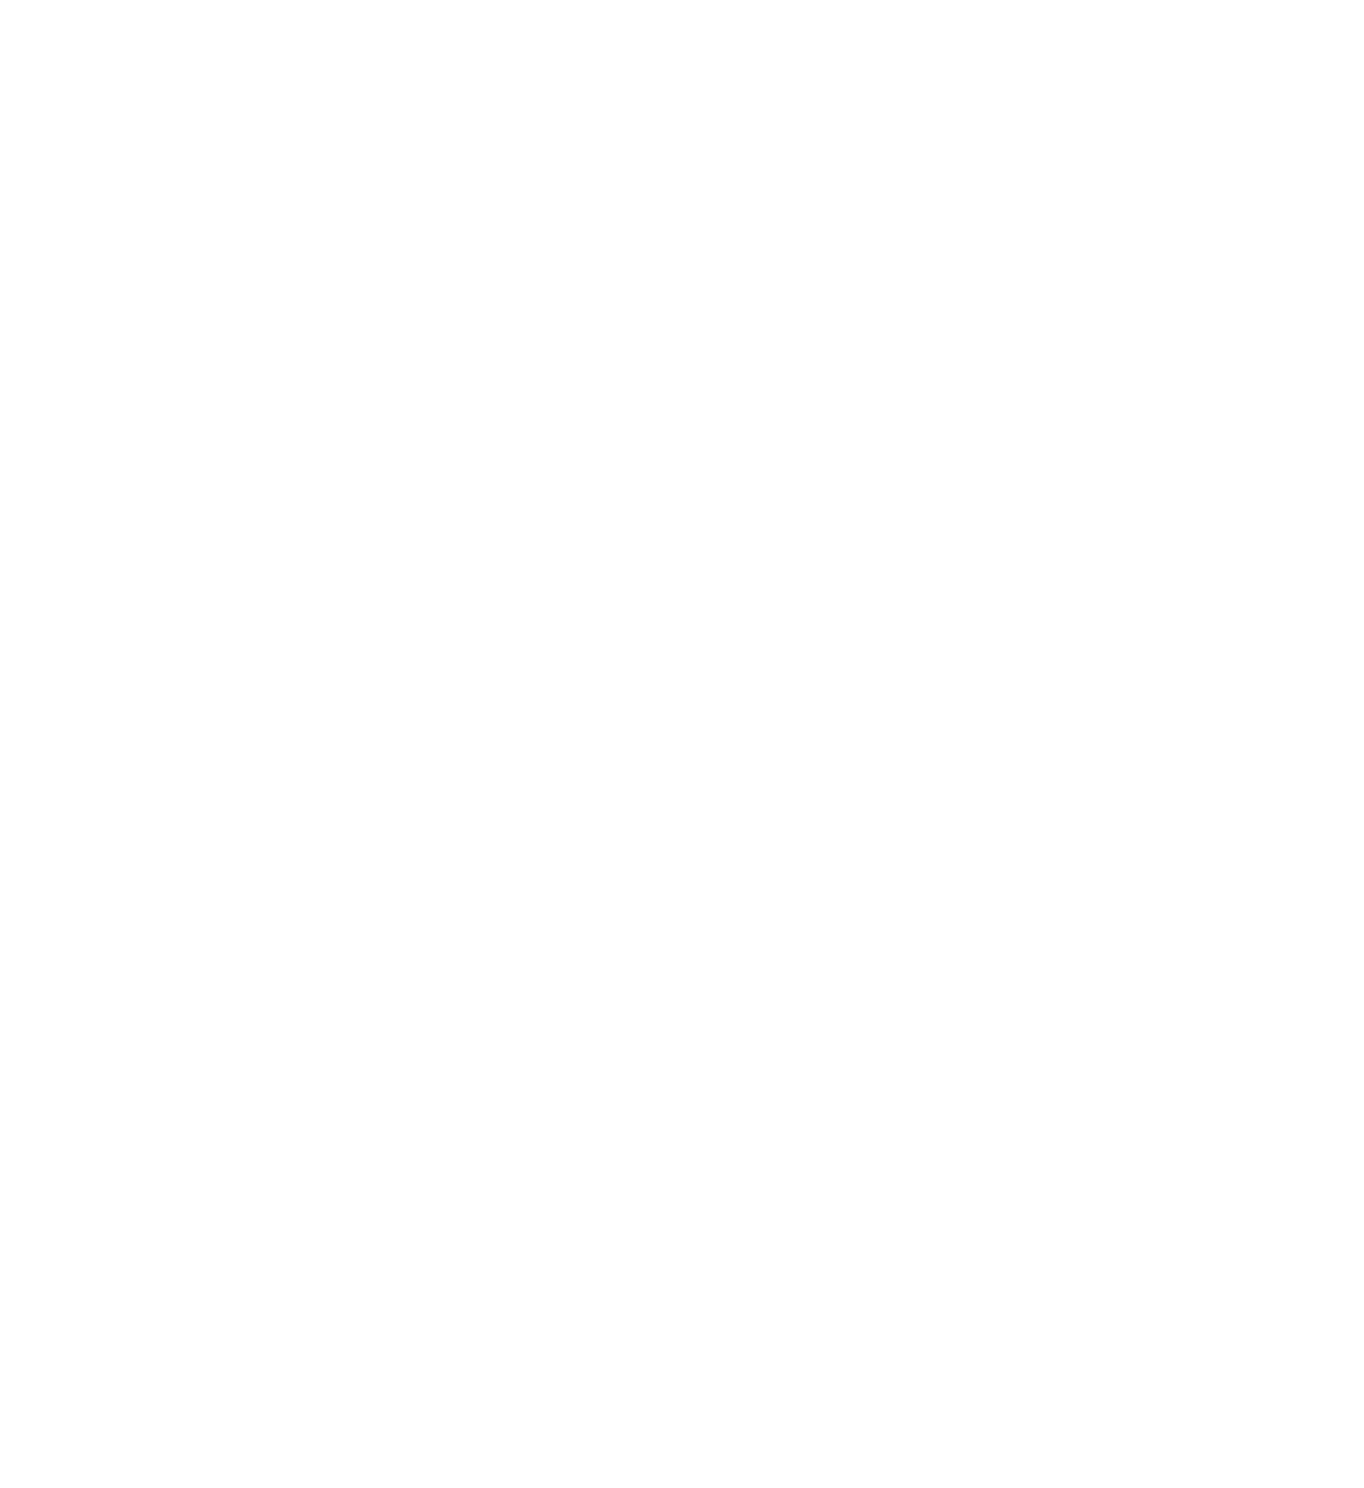 FIPSILA